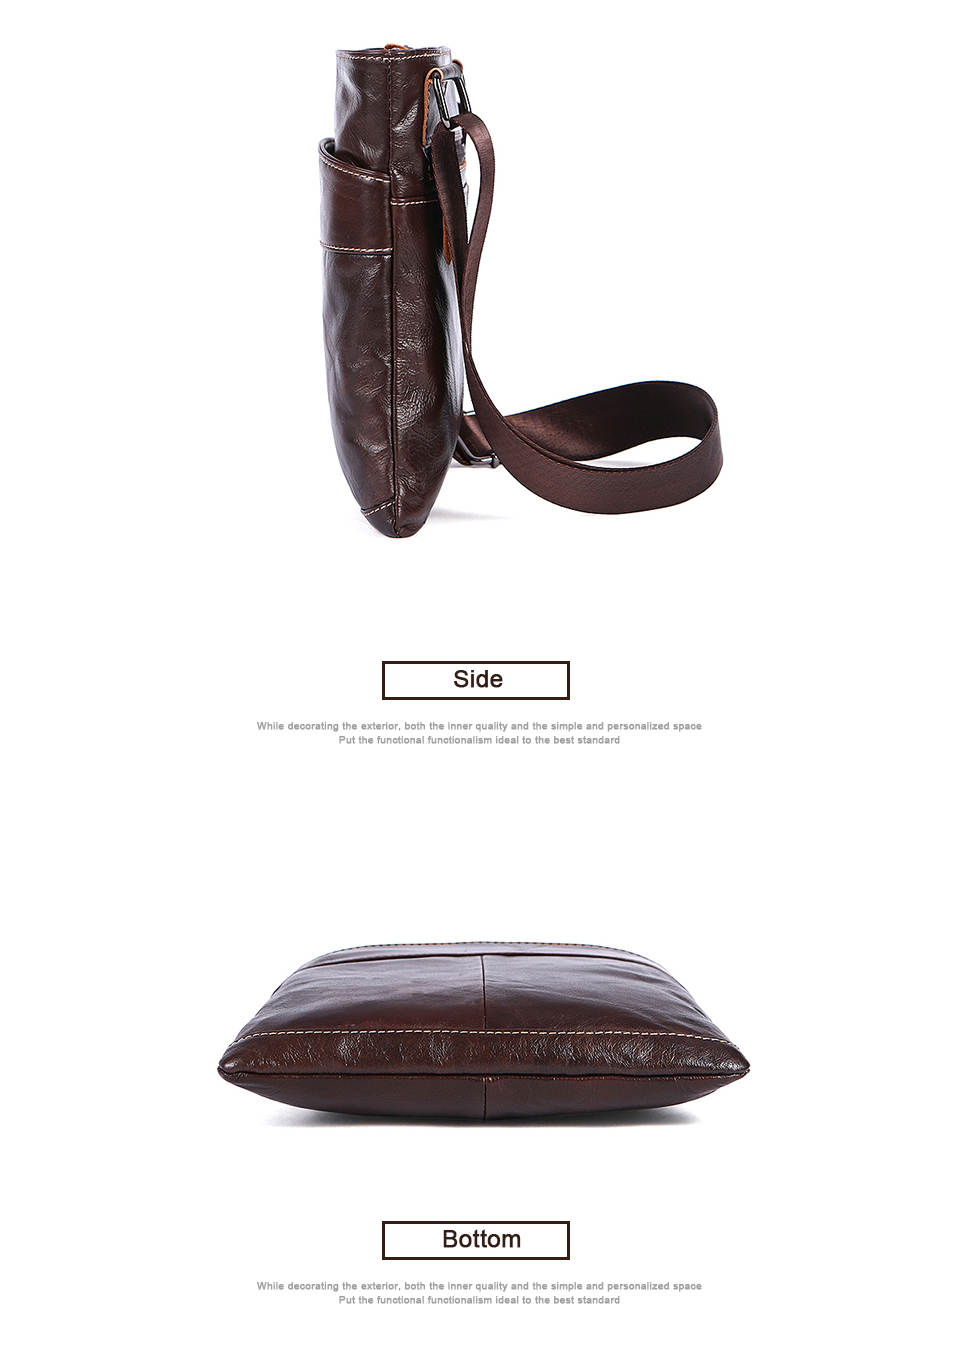 Genuine Leather Men Bag Men Messenger Bags Fashion ipad Flap Crossbody Bags Small Casual Men's Leather Shoulder Bag Man (5)